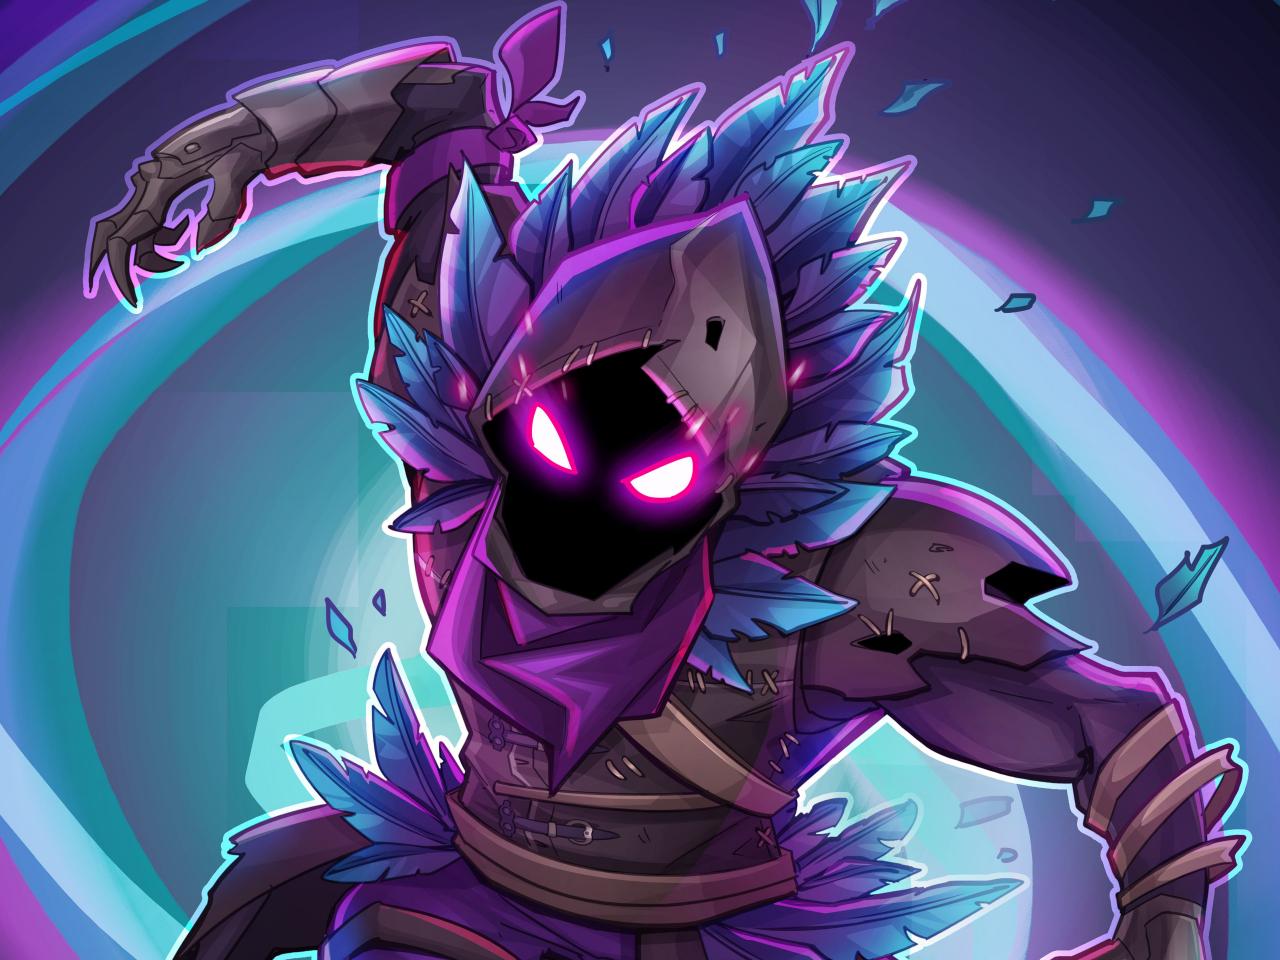 Download 1280x960 Wallpaper Raven Fortnite Battle Royale Creature Game Standard 4 3 Fullscreen 1280x960 Hd Image Background 8126